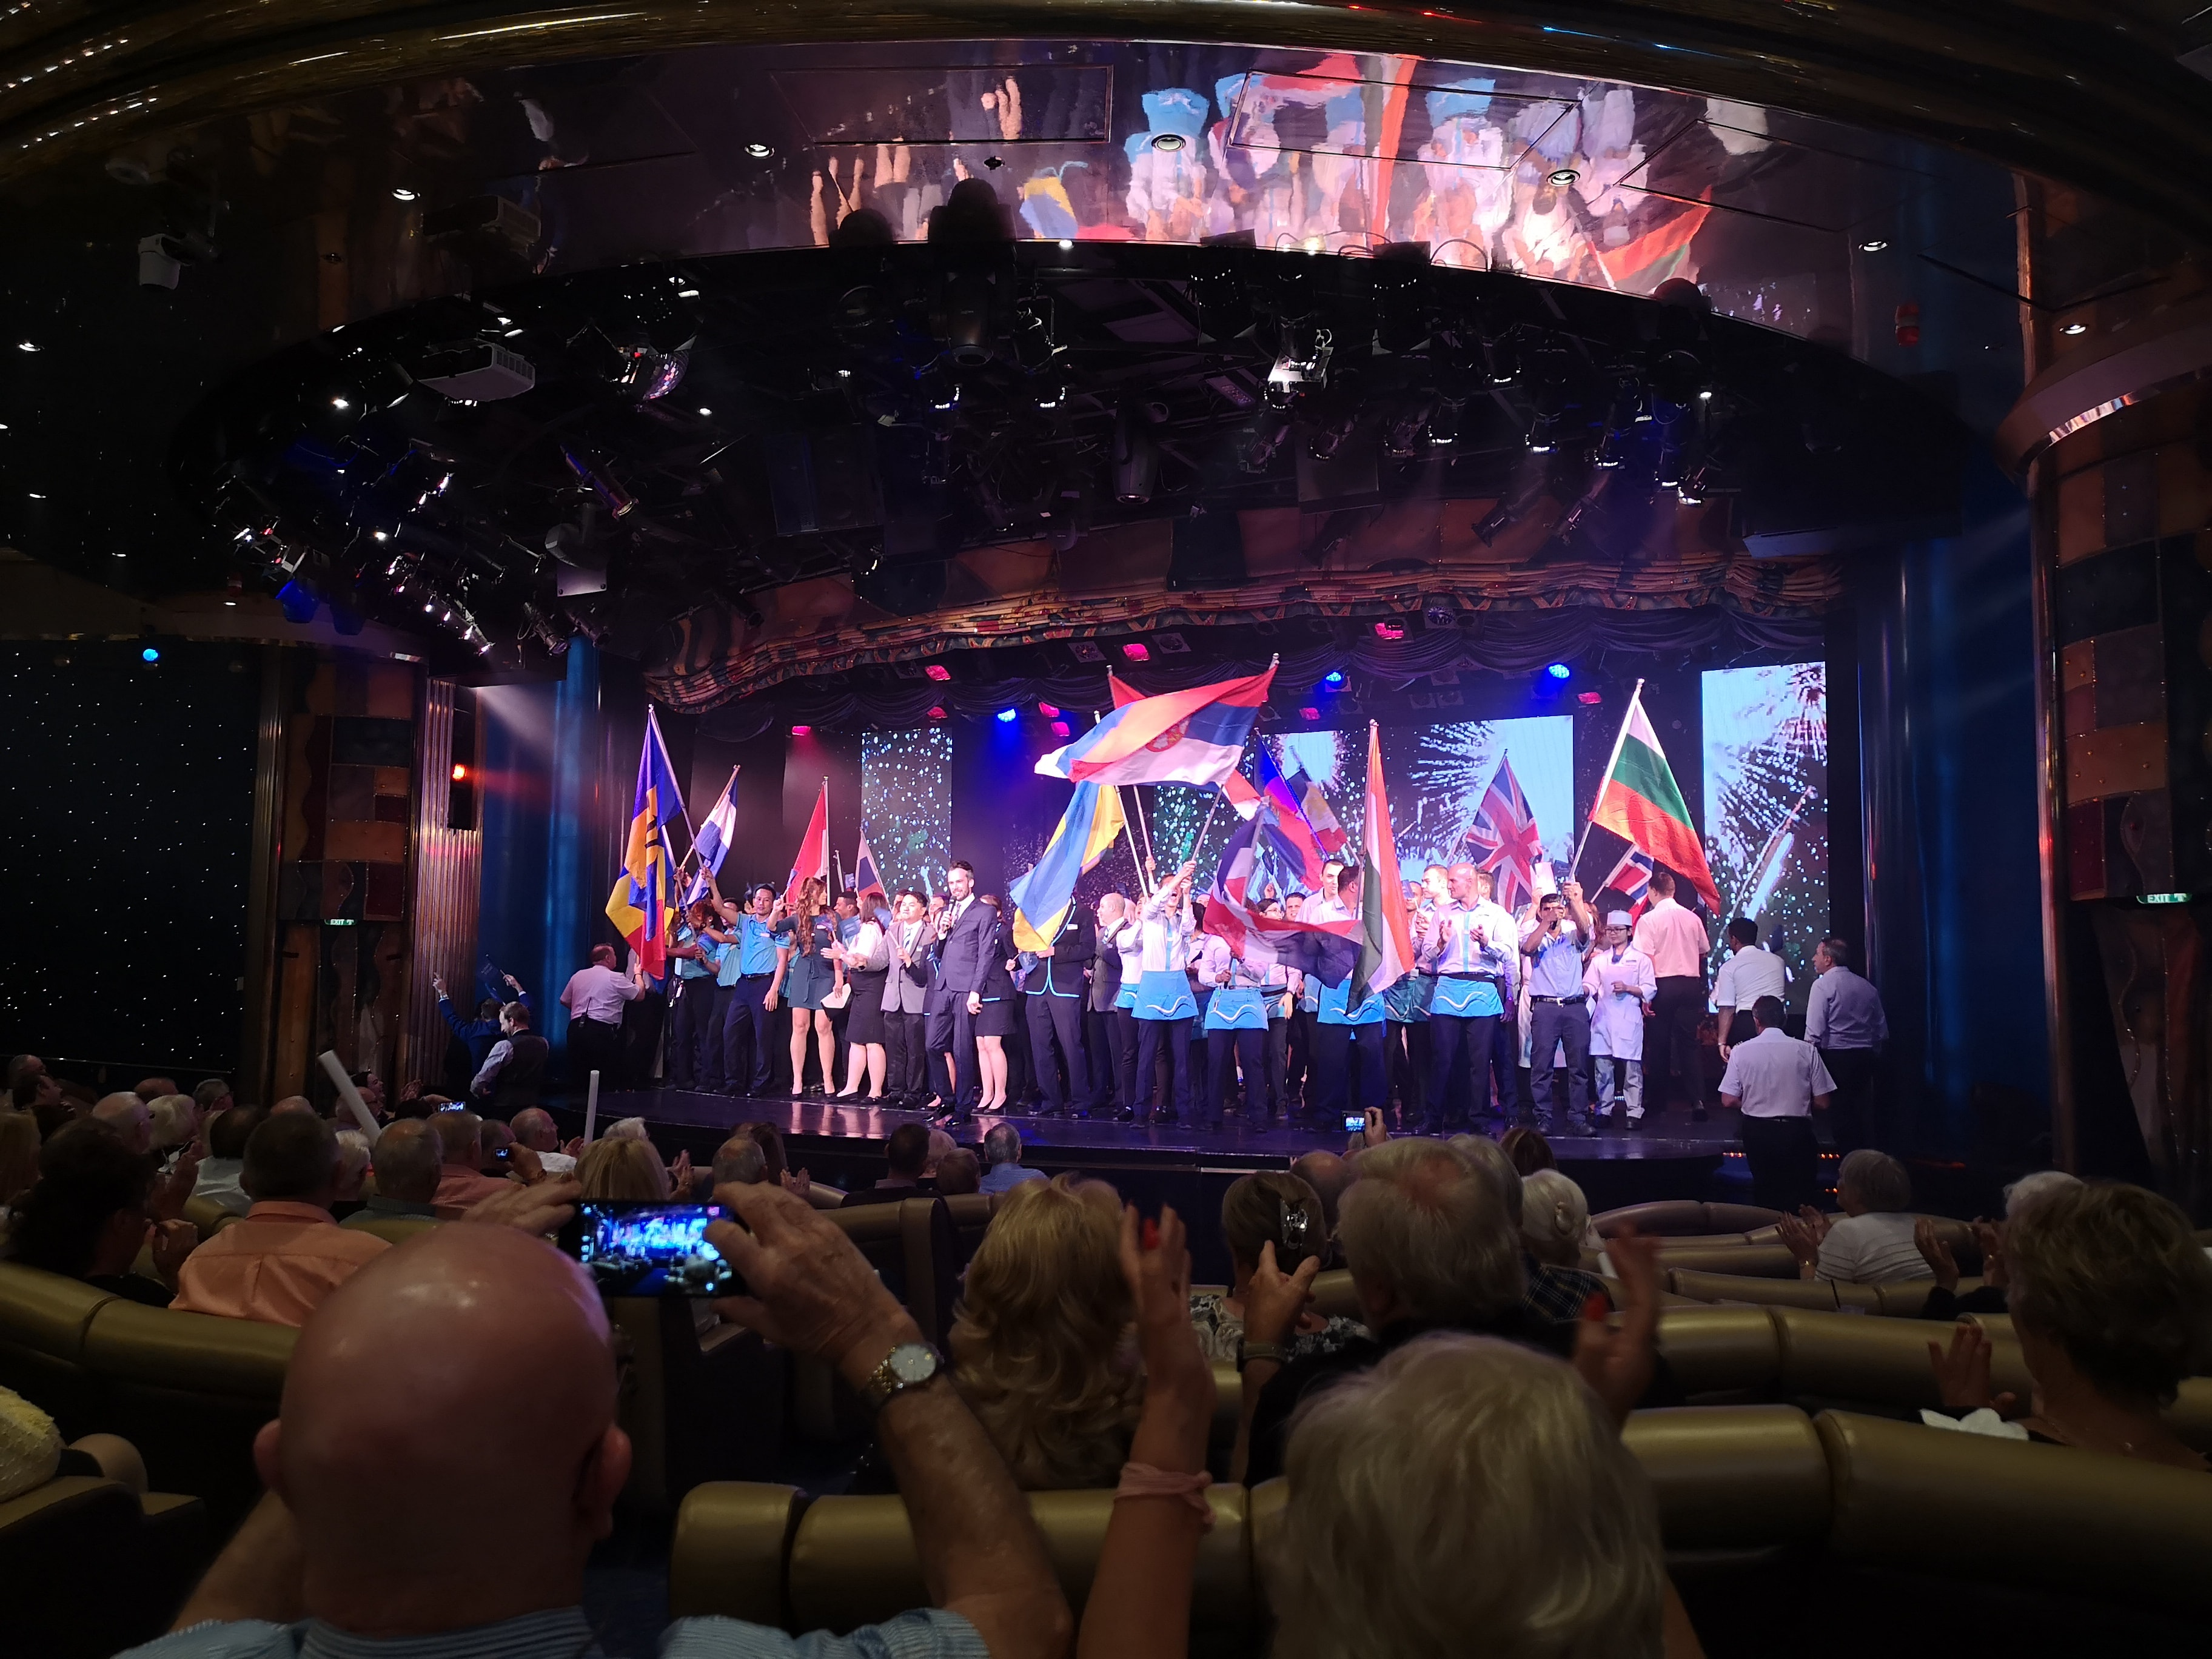 Marella Discovery Theatre Broadway Showlounge Entertainment Team